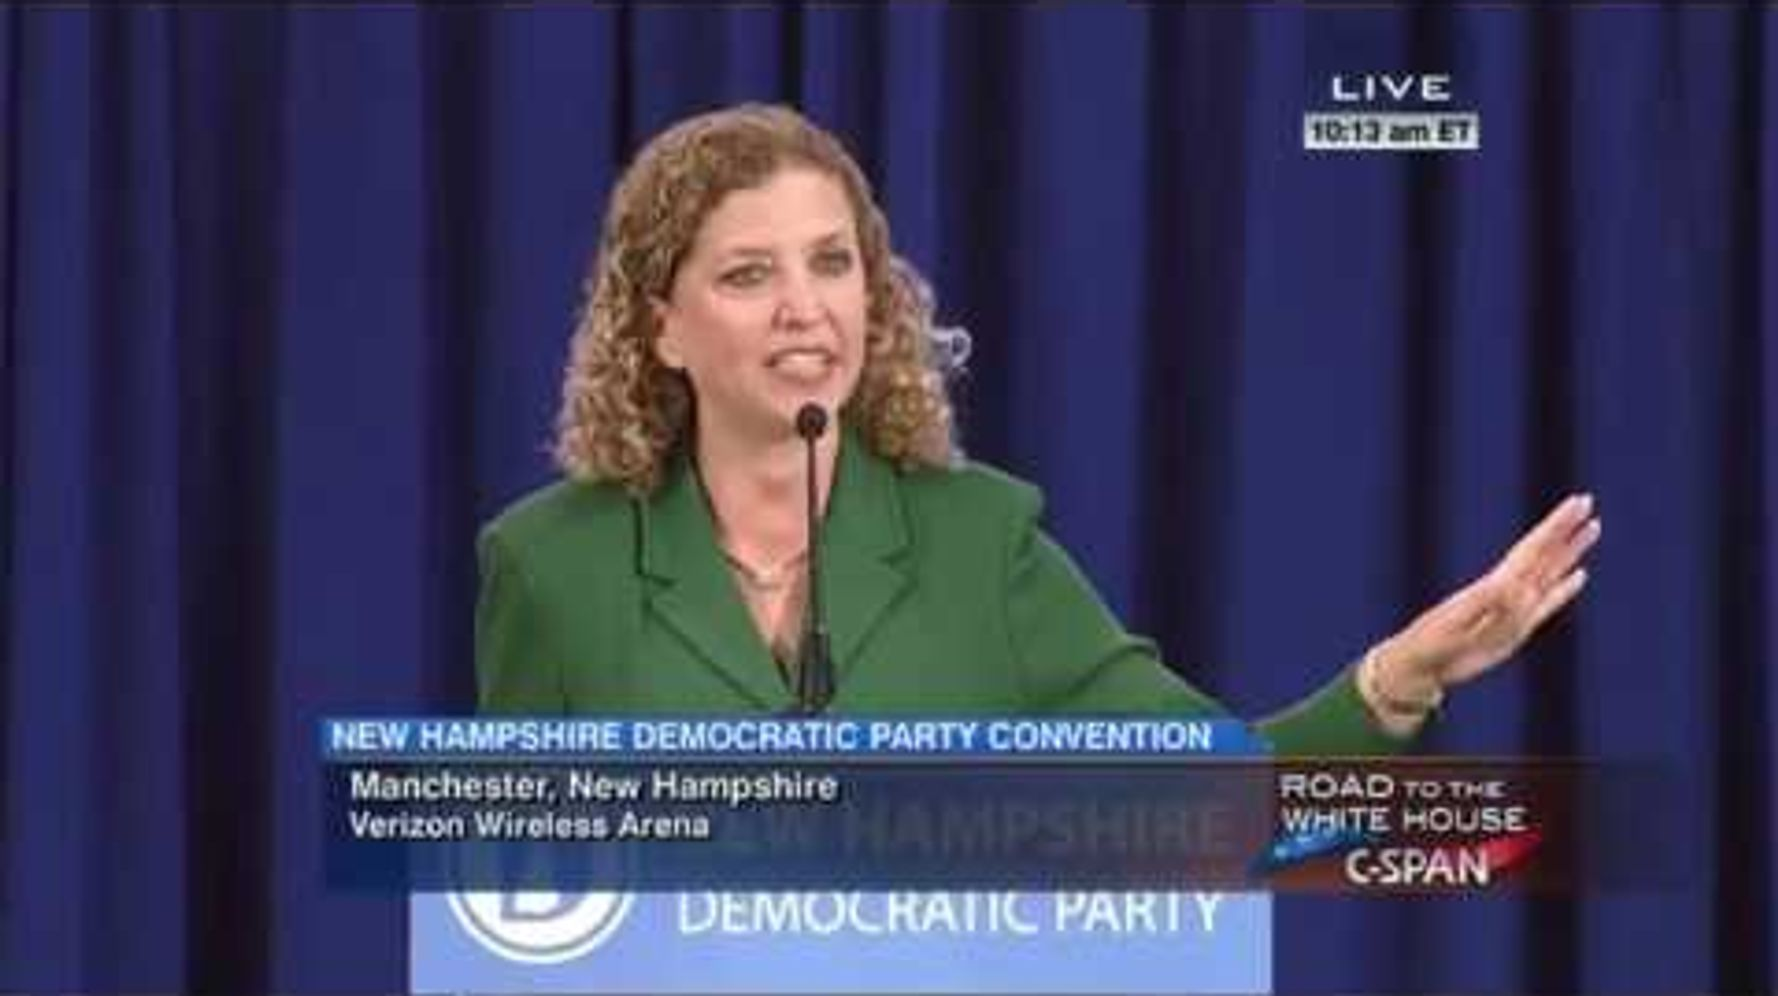 Democrats Edge Out Debbie Wasserman Schultz With Clinton's Pick To Run DNC